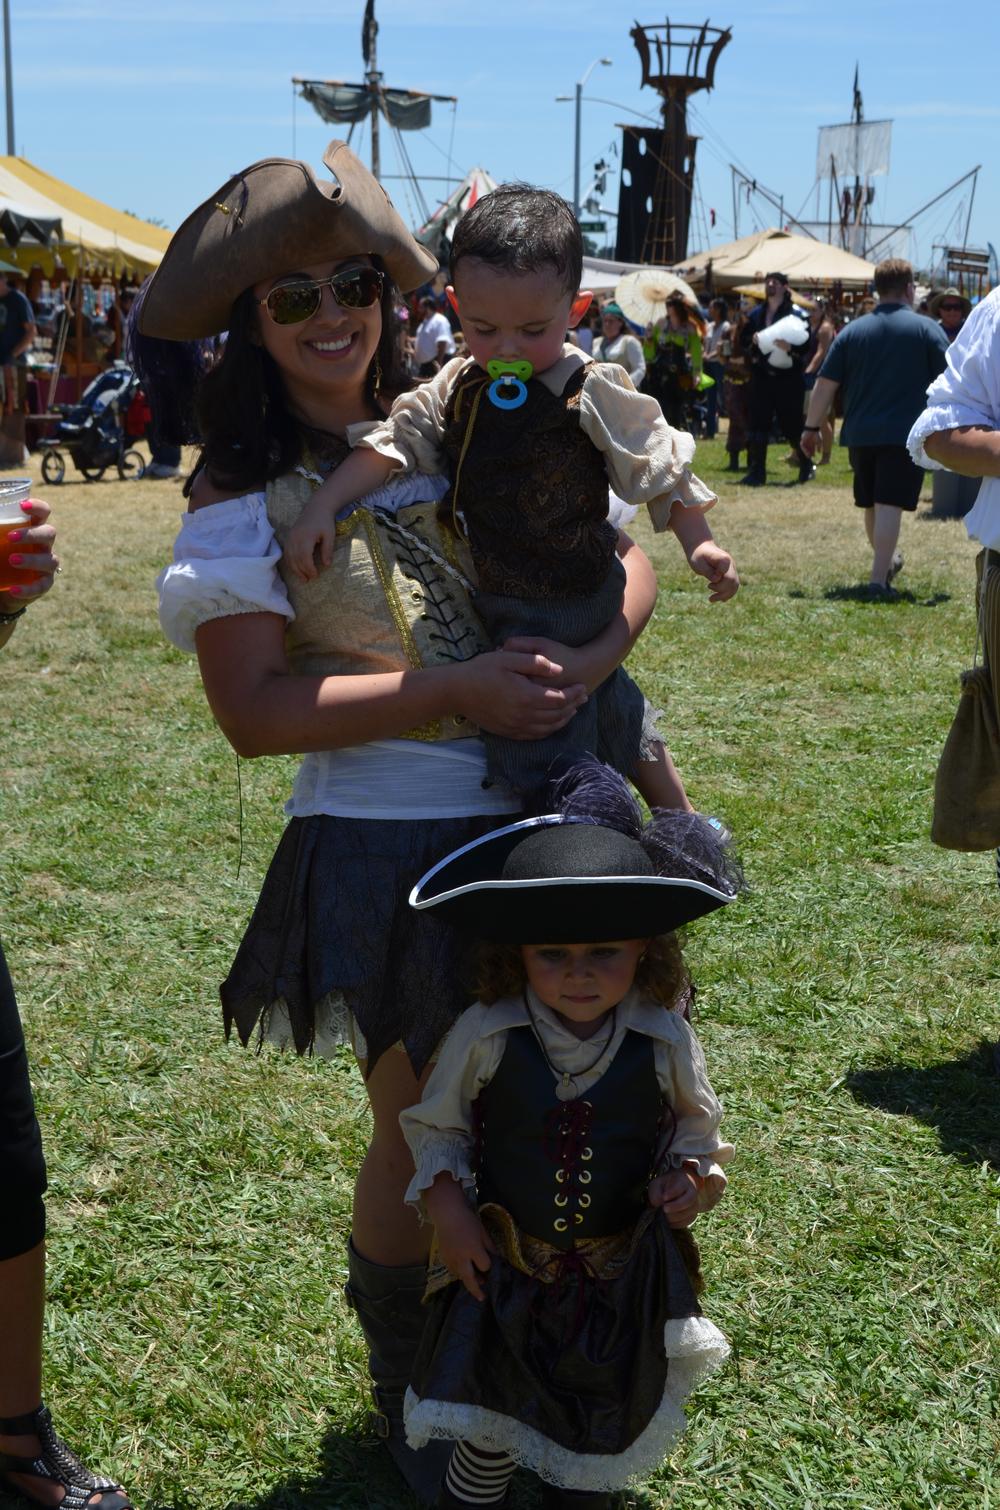 Pirate Family Pirate Fest.jpg